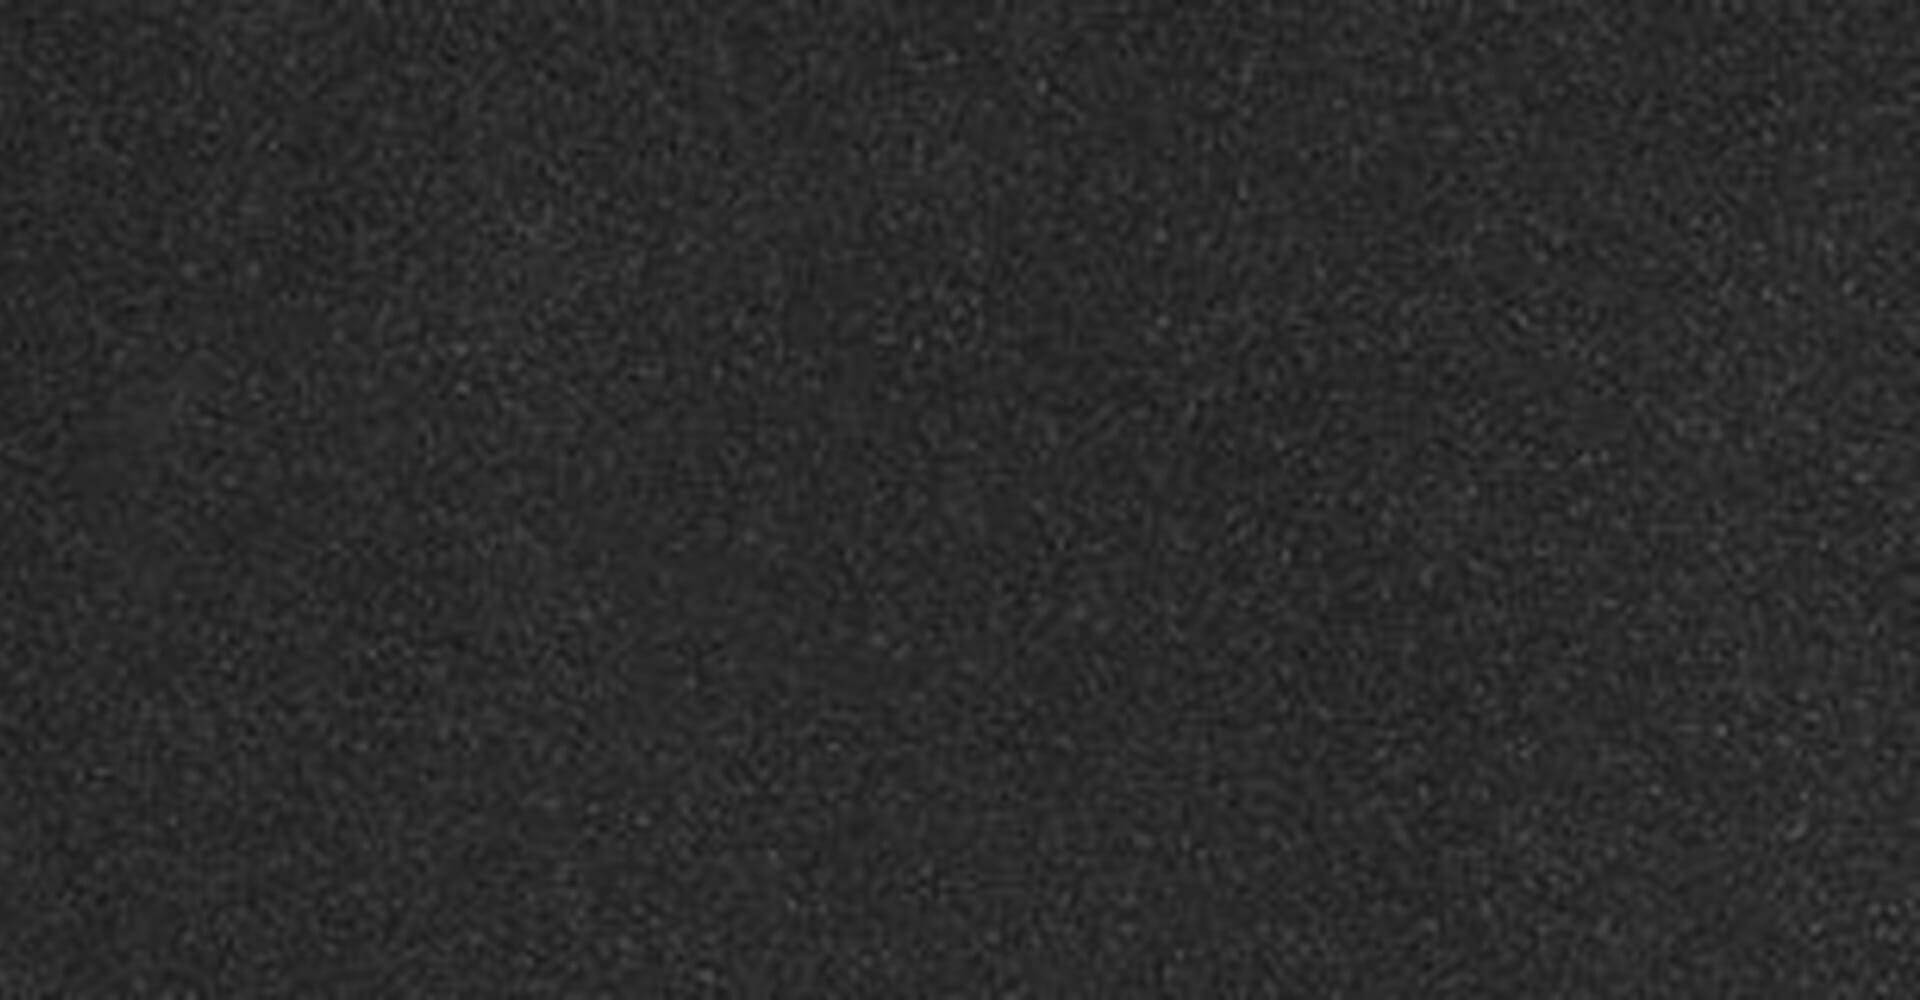 Absolute Black фото 1 — камень от Bevers Marmyr